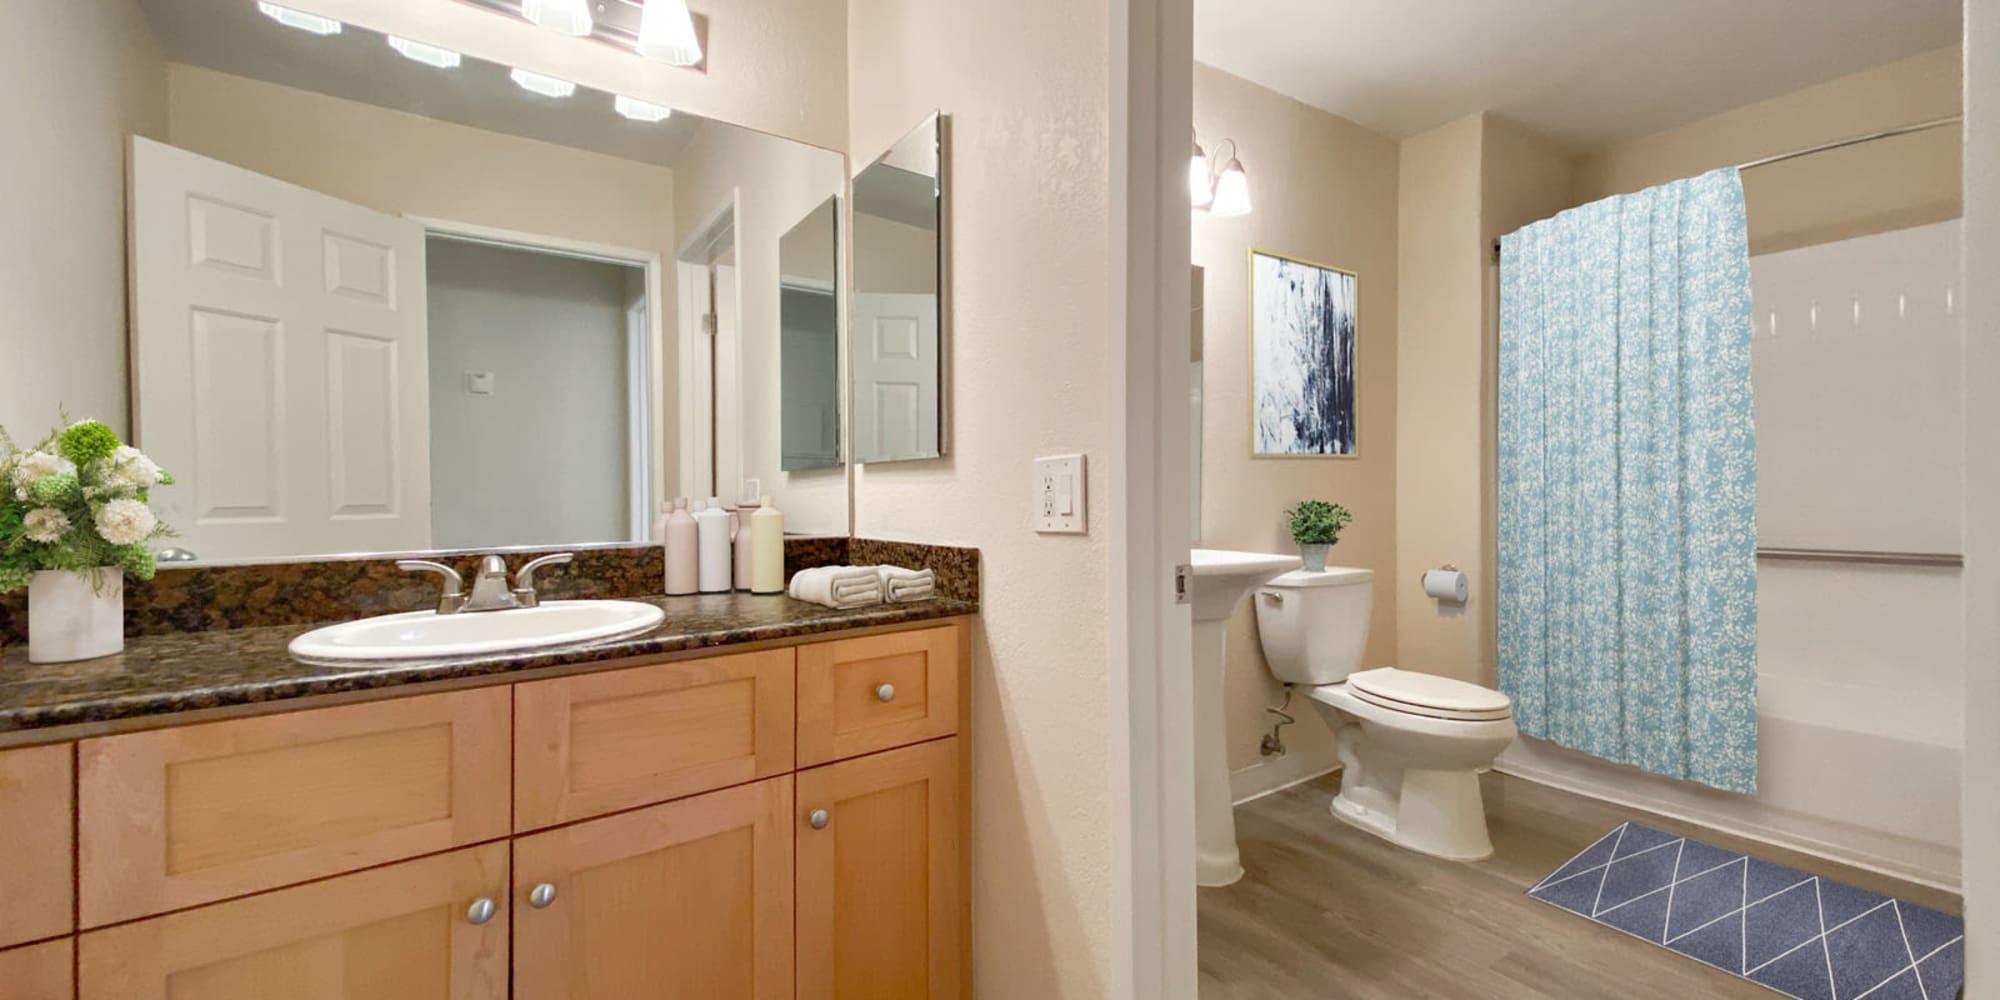 Primary bedroom's en suite bathroom with a large vanity mirror in a model home at Pleasanton Place Apartment Homes in Pleasanton, California